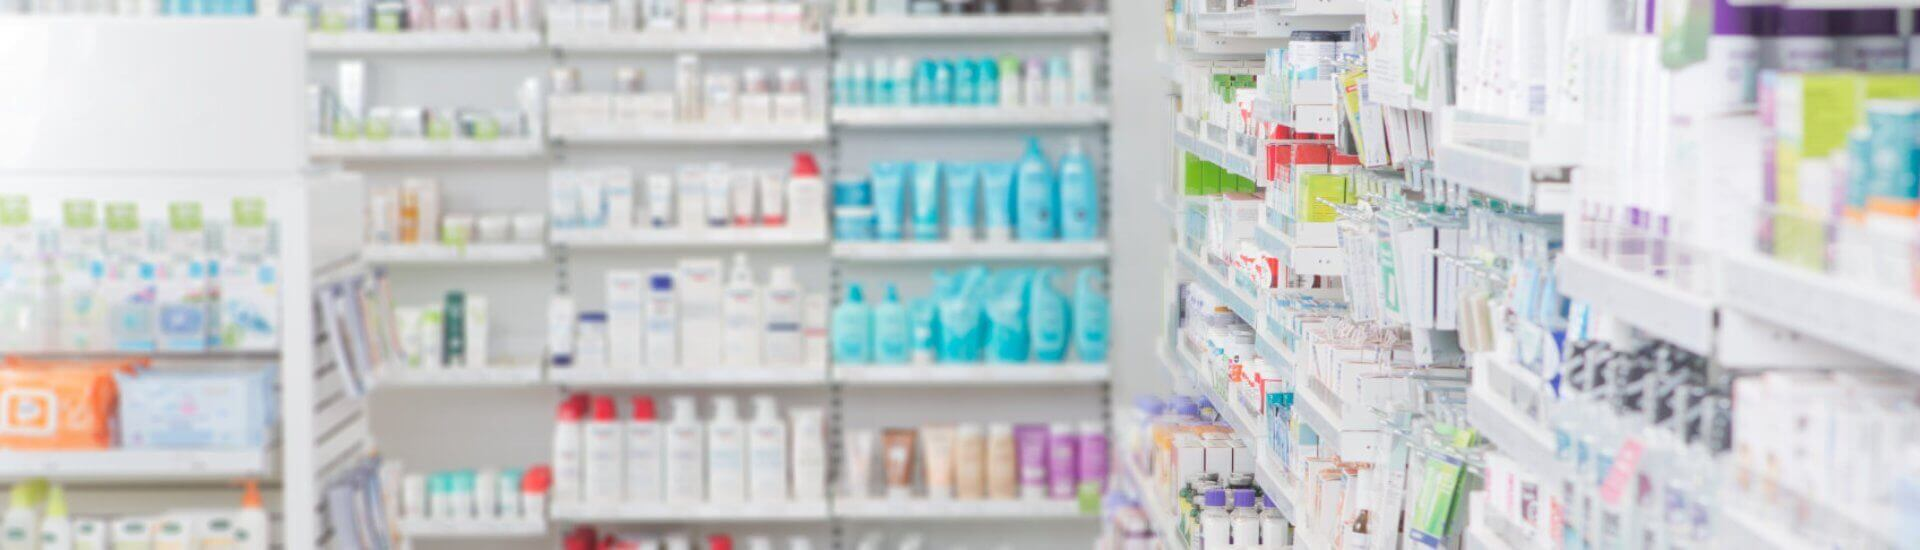 medicines in the pharmacy